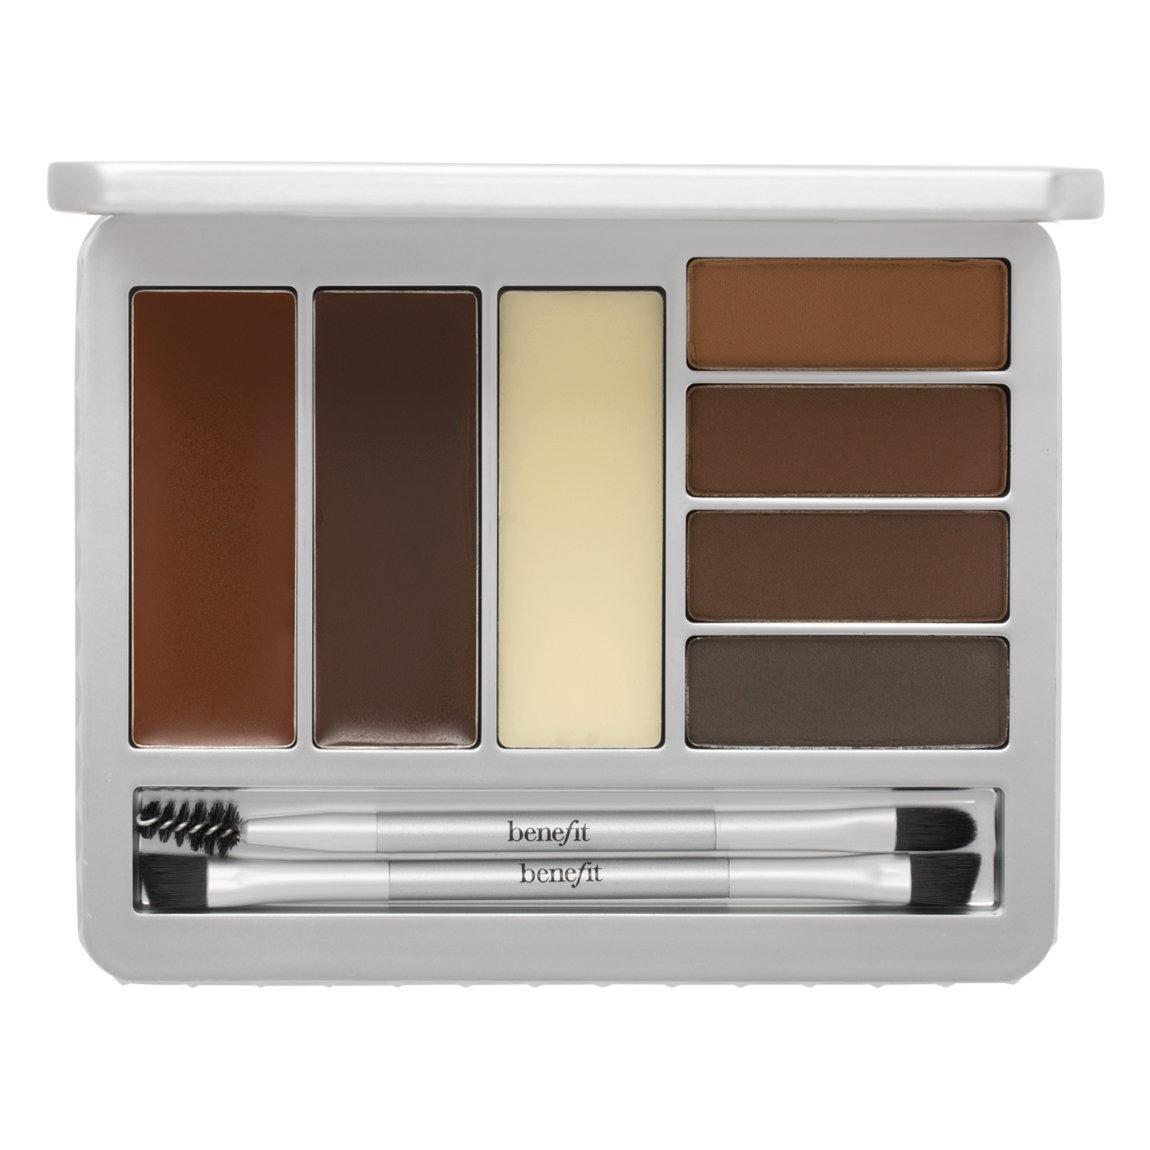 Benefit Cosmetics Brow Zings Pro Palette Medium-Dark product swatch.